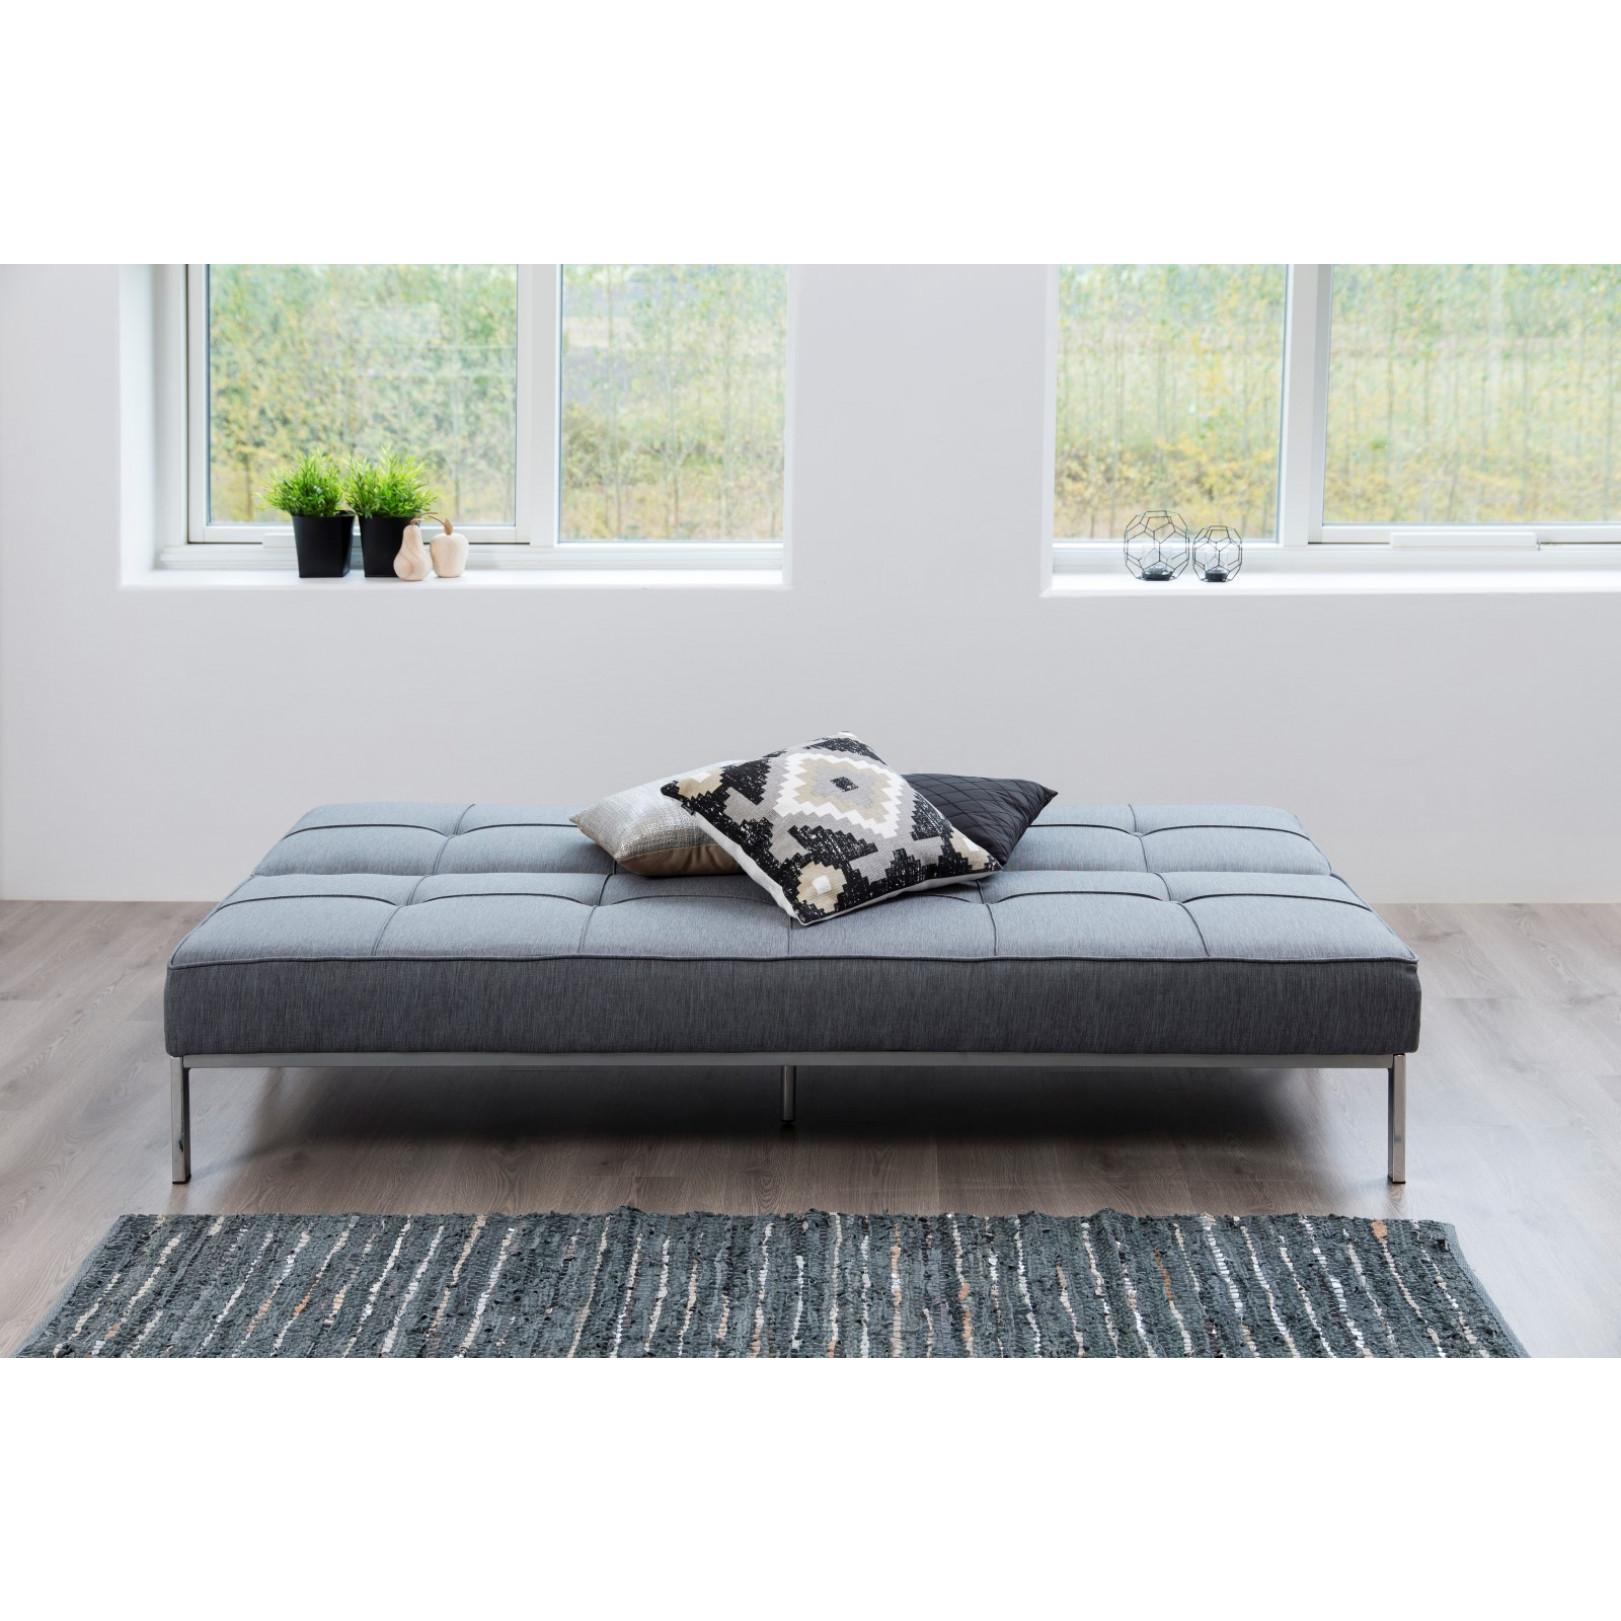 Sofa Bed Peralta | Grey